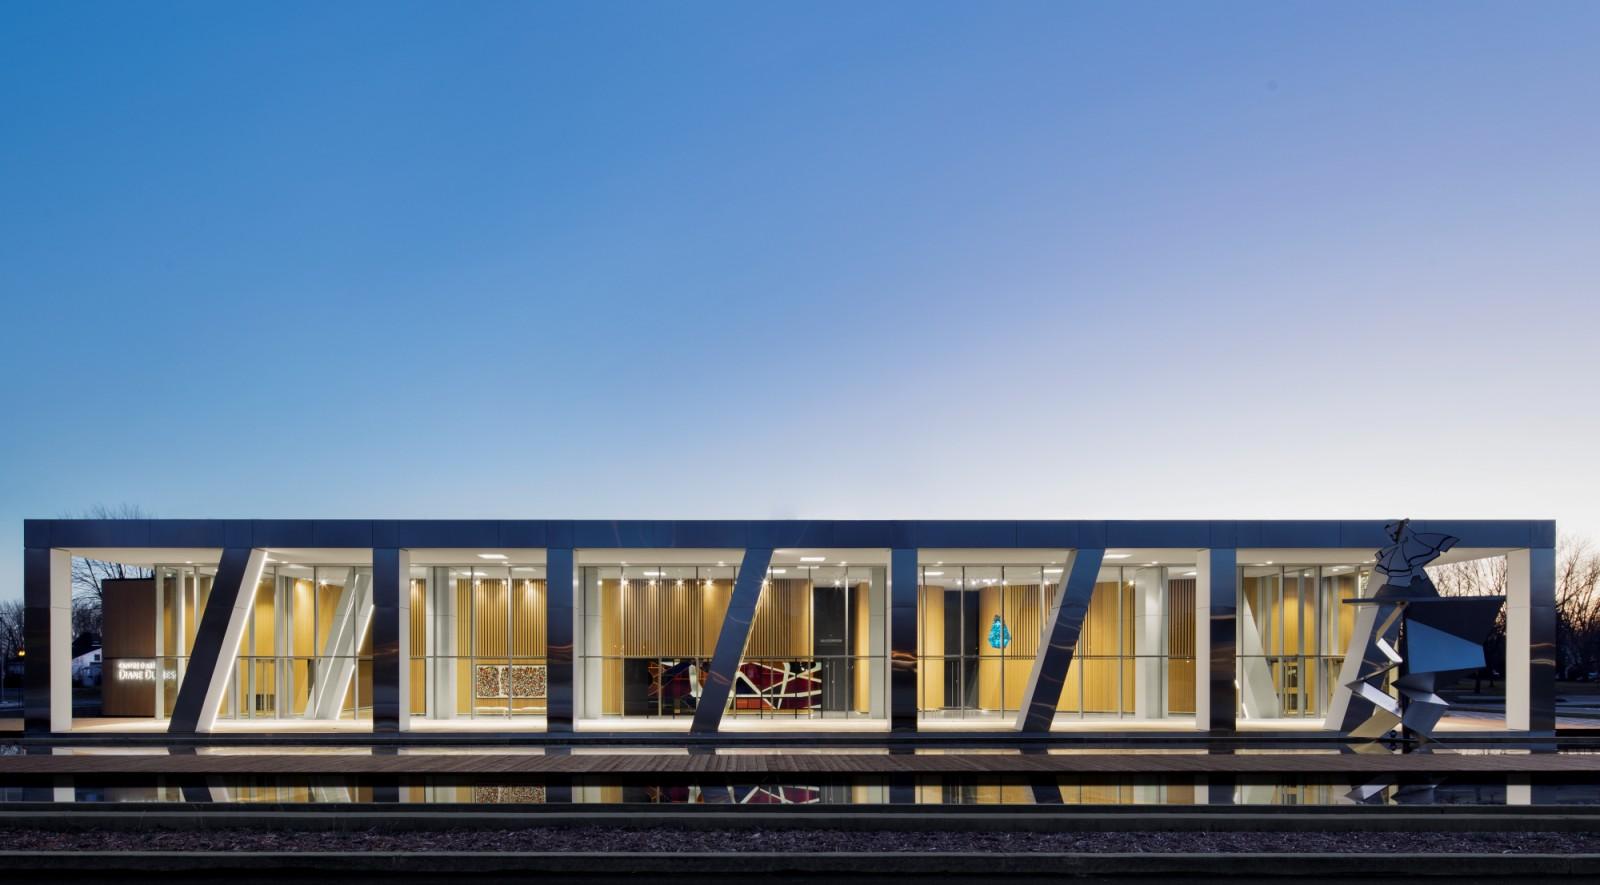 Centre d art diane dufresne de repentigny by acdf architecture for Photo d architecture